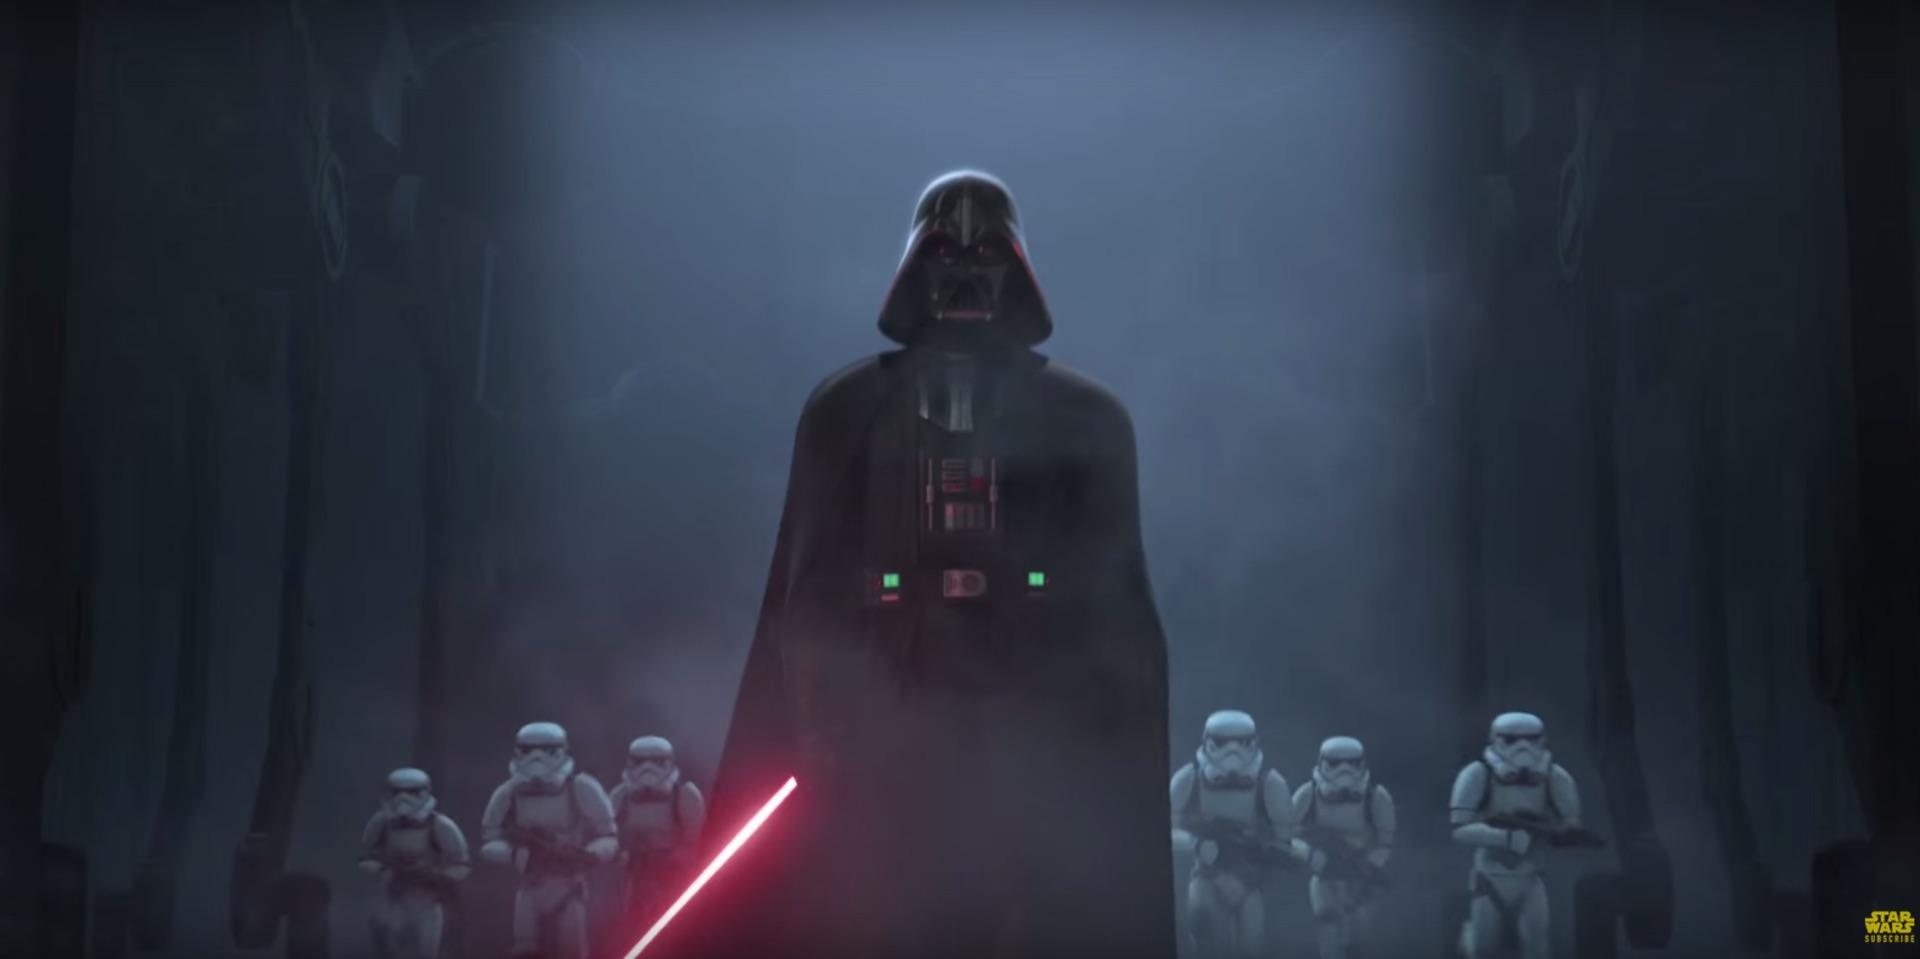 Star Wars Rebels - Season 2 Trailer - Darth Vader